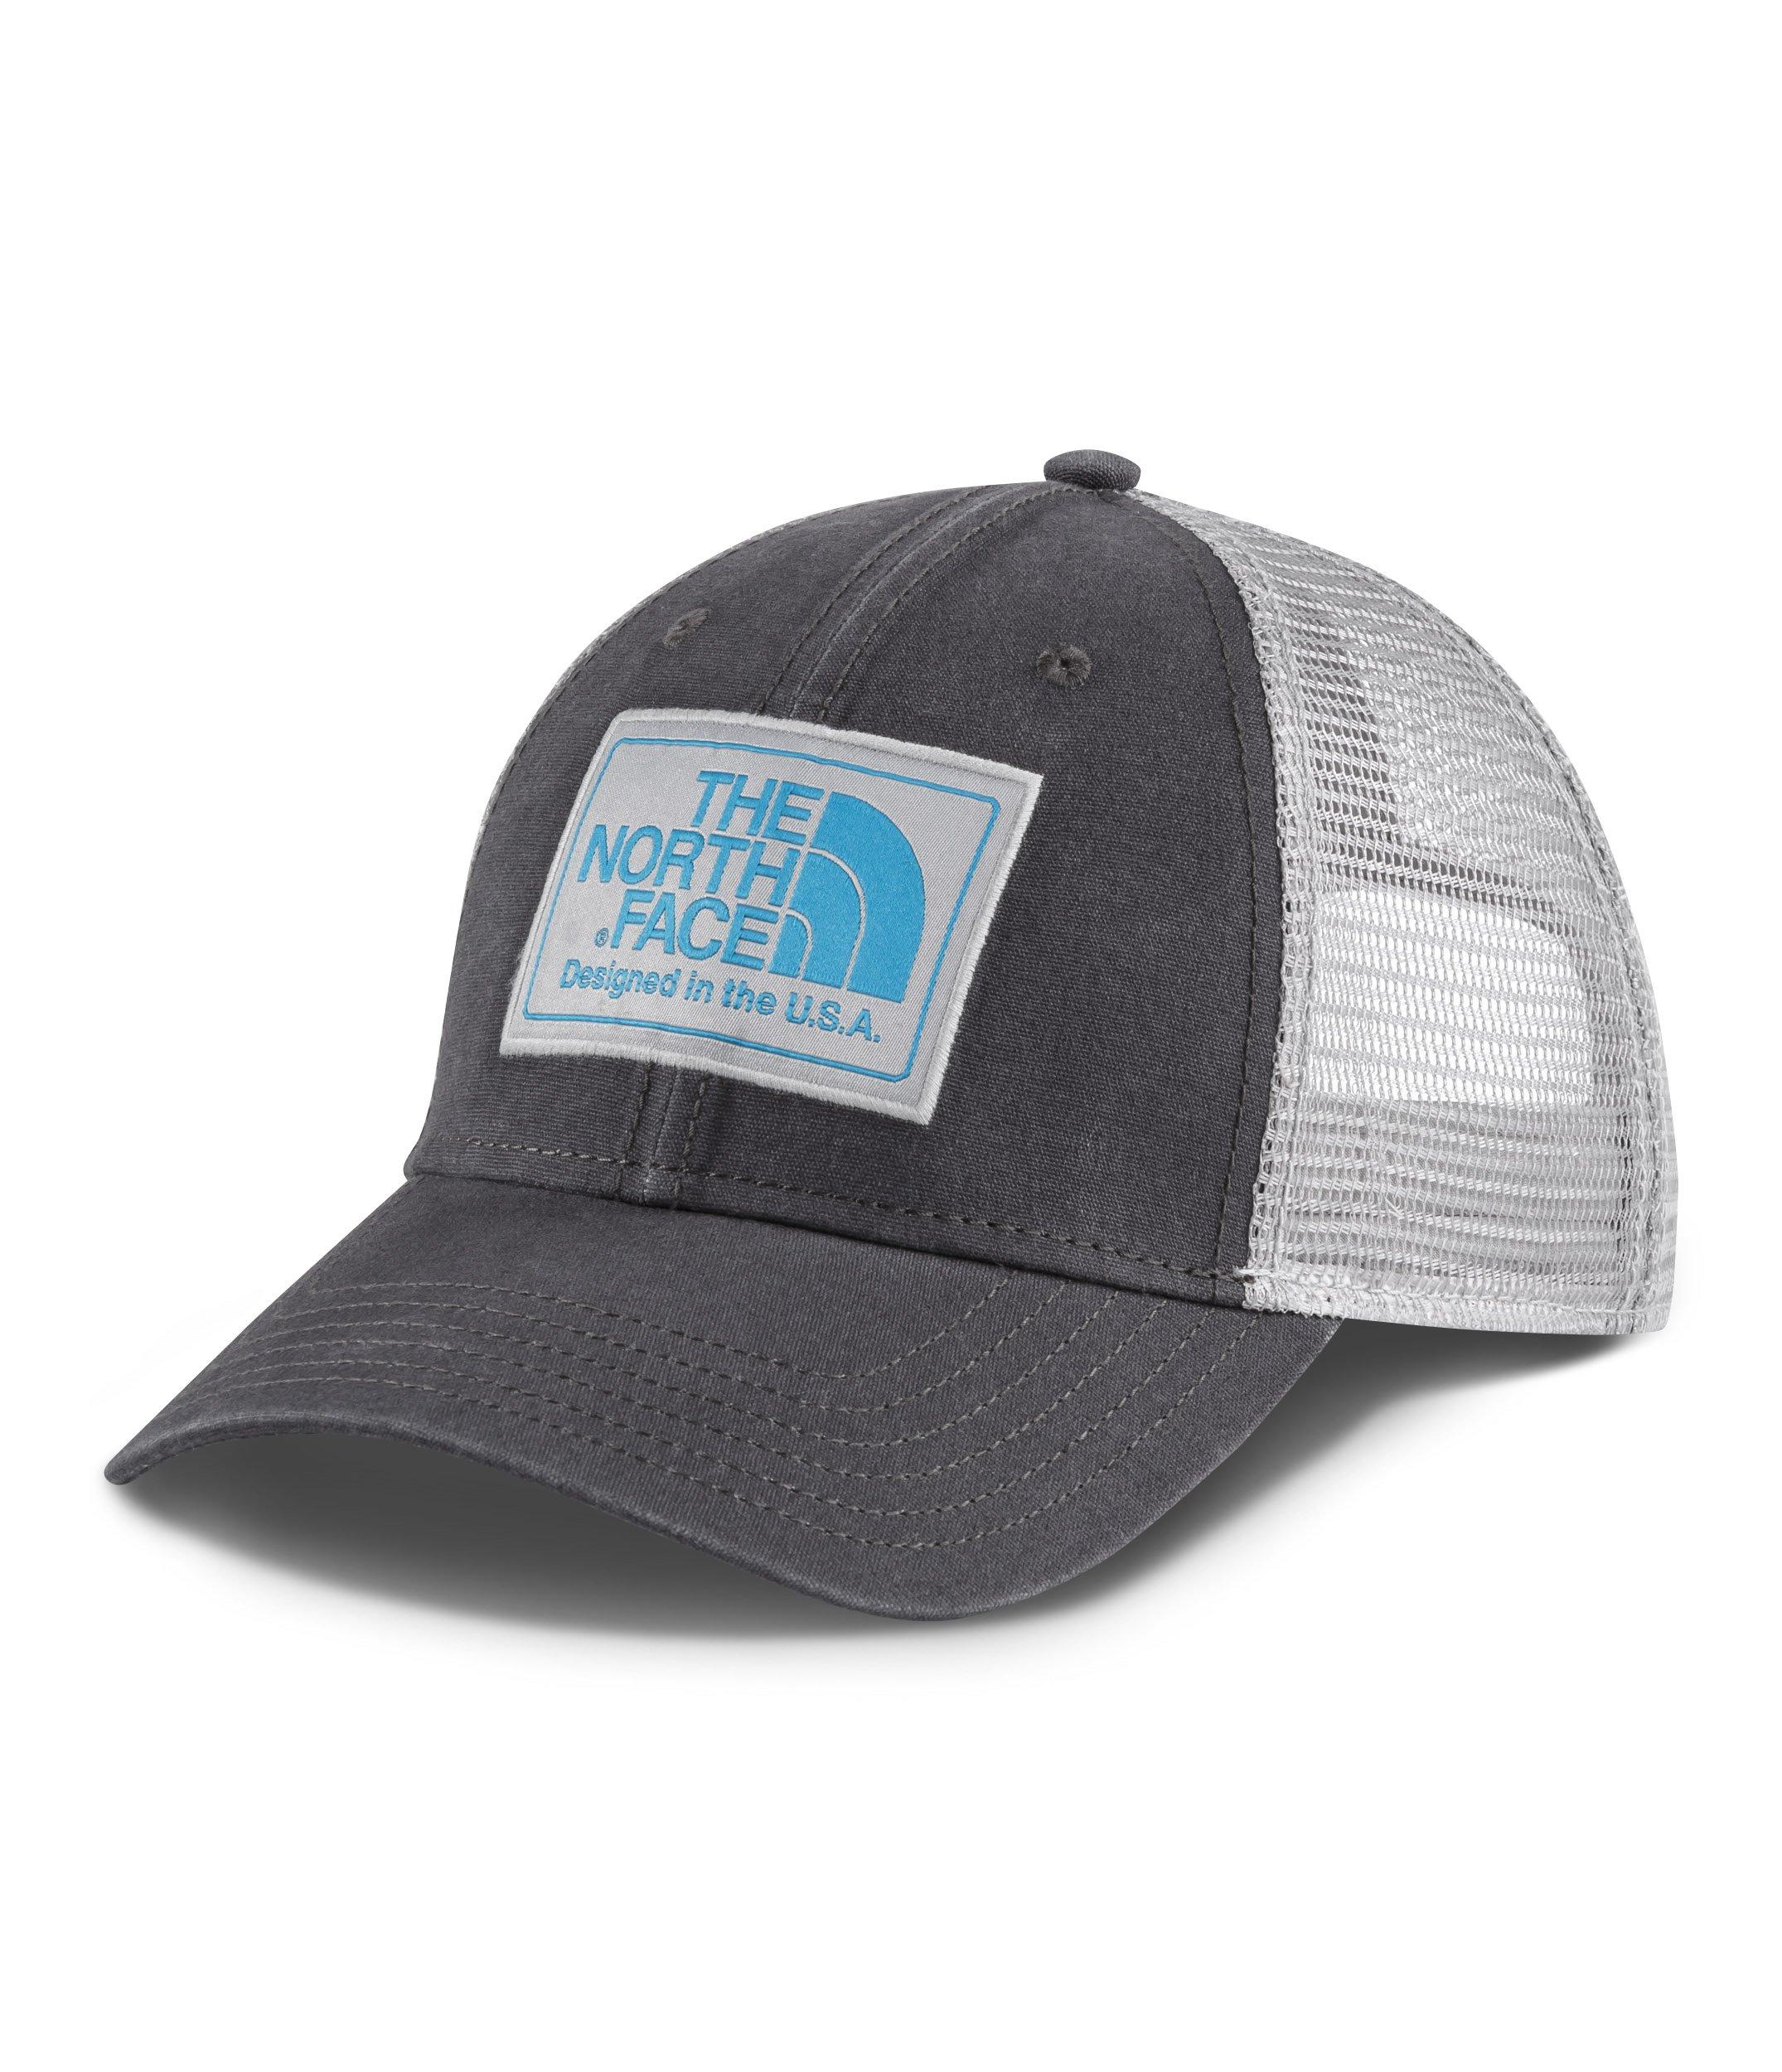 The North Face Mudder Trucker Hat - Asphalt Grey/High Rise Grey